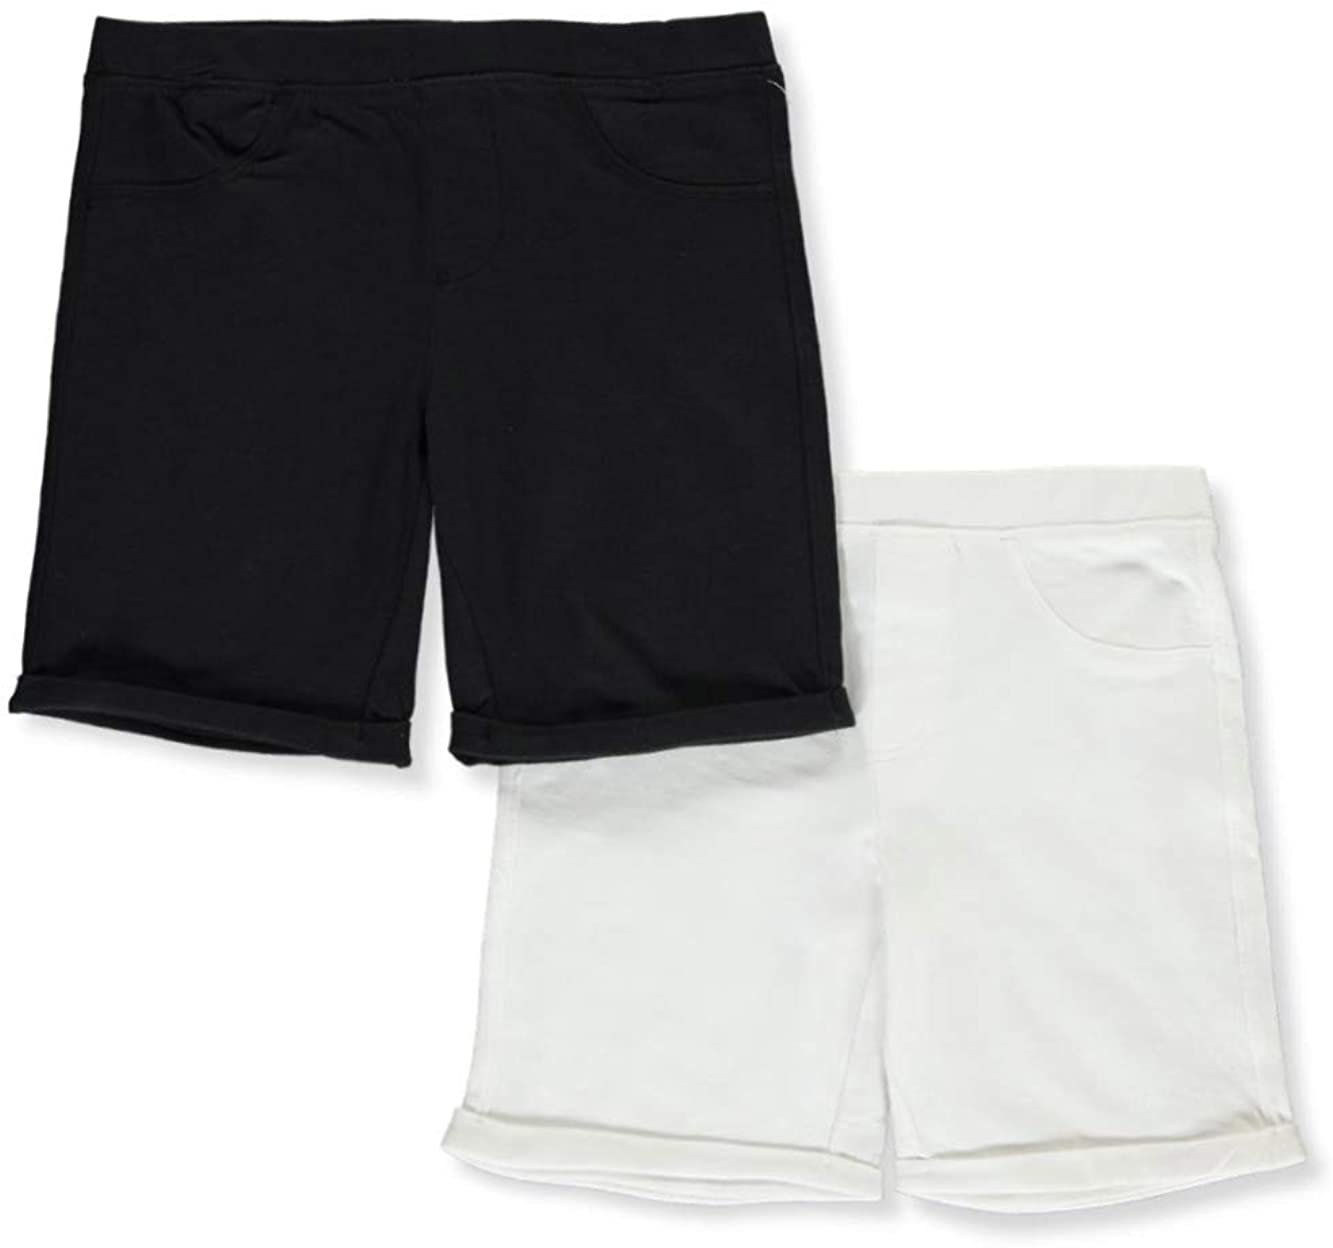 Dreamstar Big Girls Fleece 2-Pack Bermuda Shorts - White/Black, 7-8